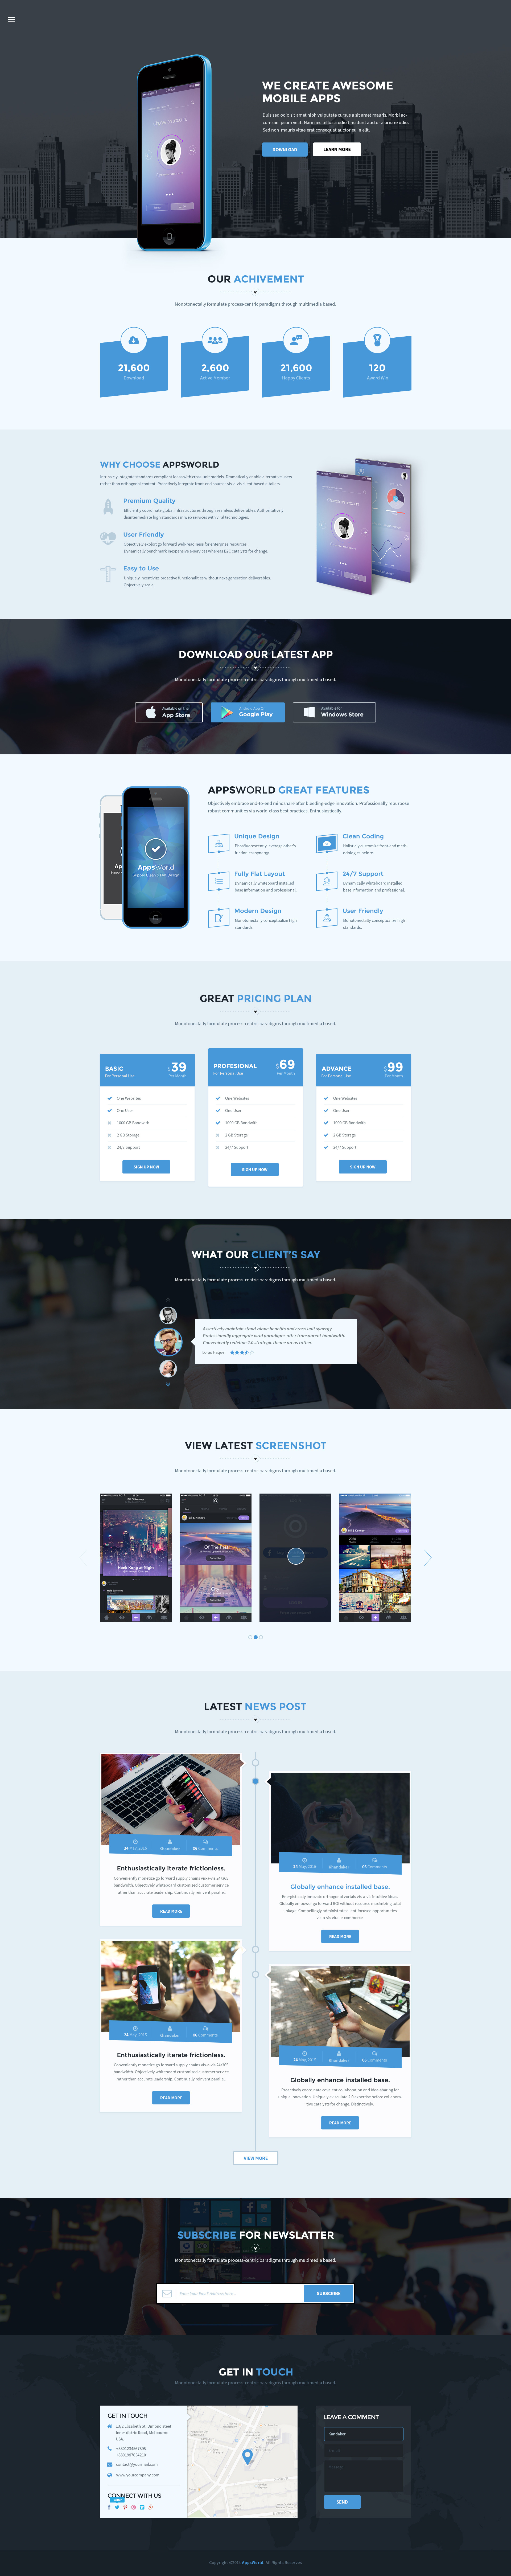 https://dribbble.com/shots/2138505-AppsWorld-Apps-Landing-Page